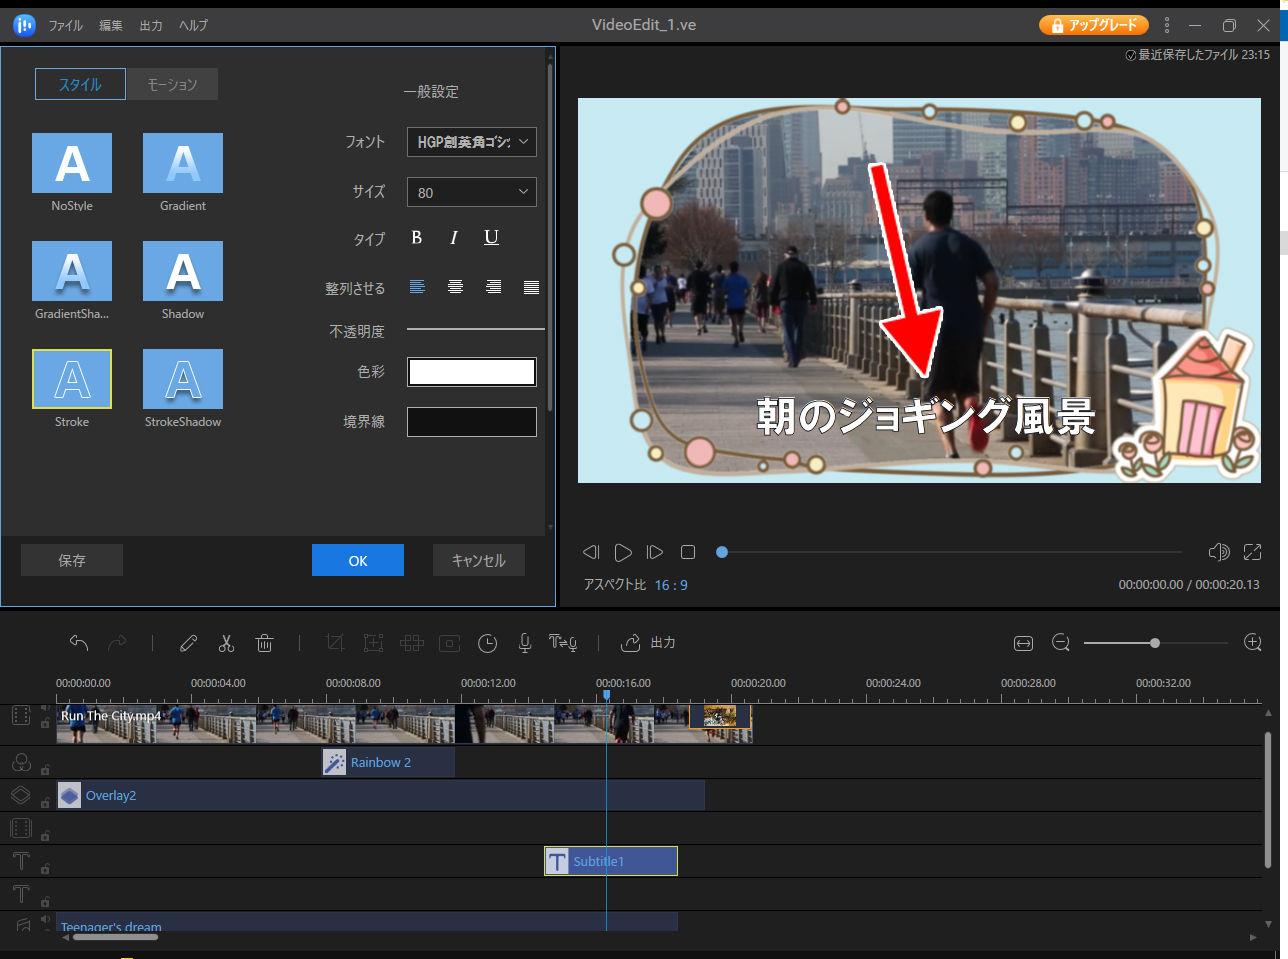 EaseUS Video Editorの文字のフチ